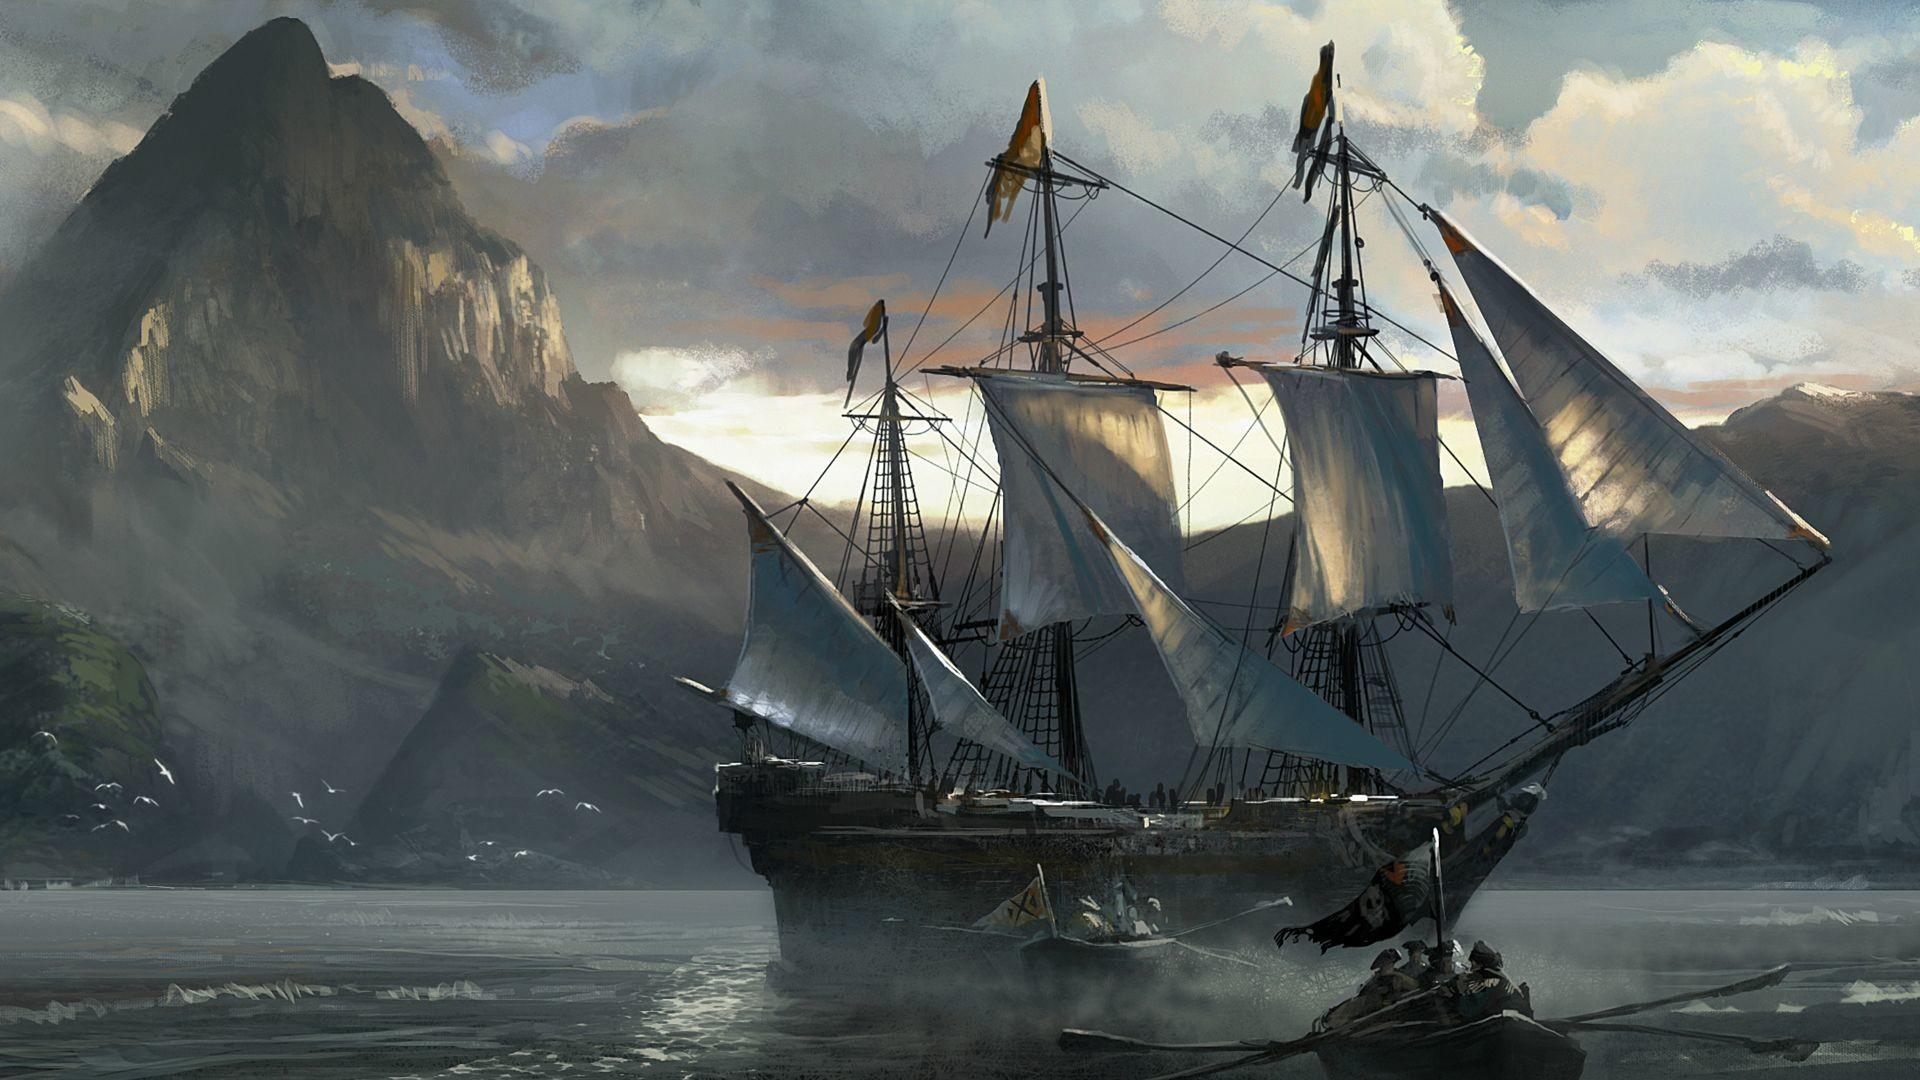 Pirate ship wallpaper hd – photo#28